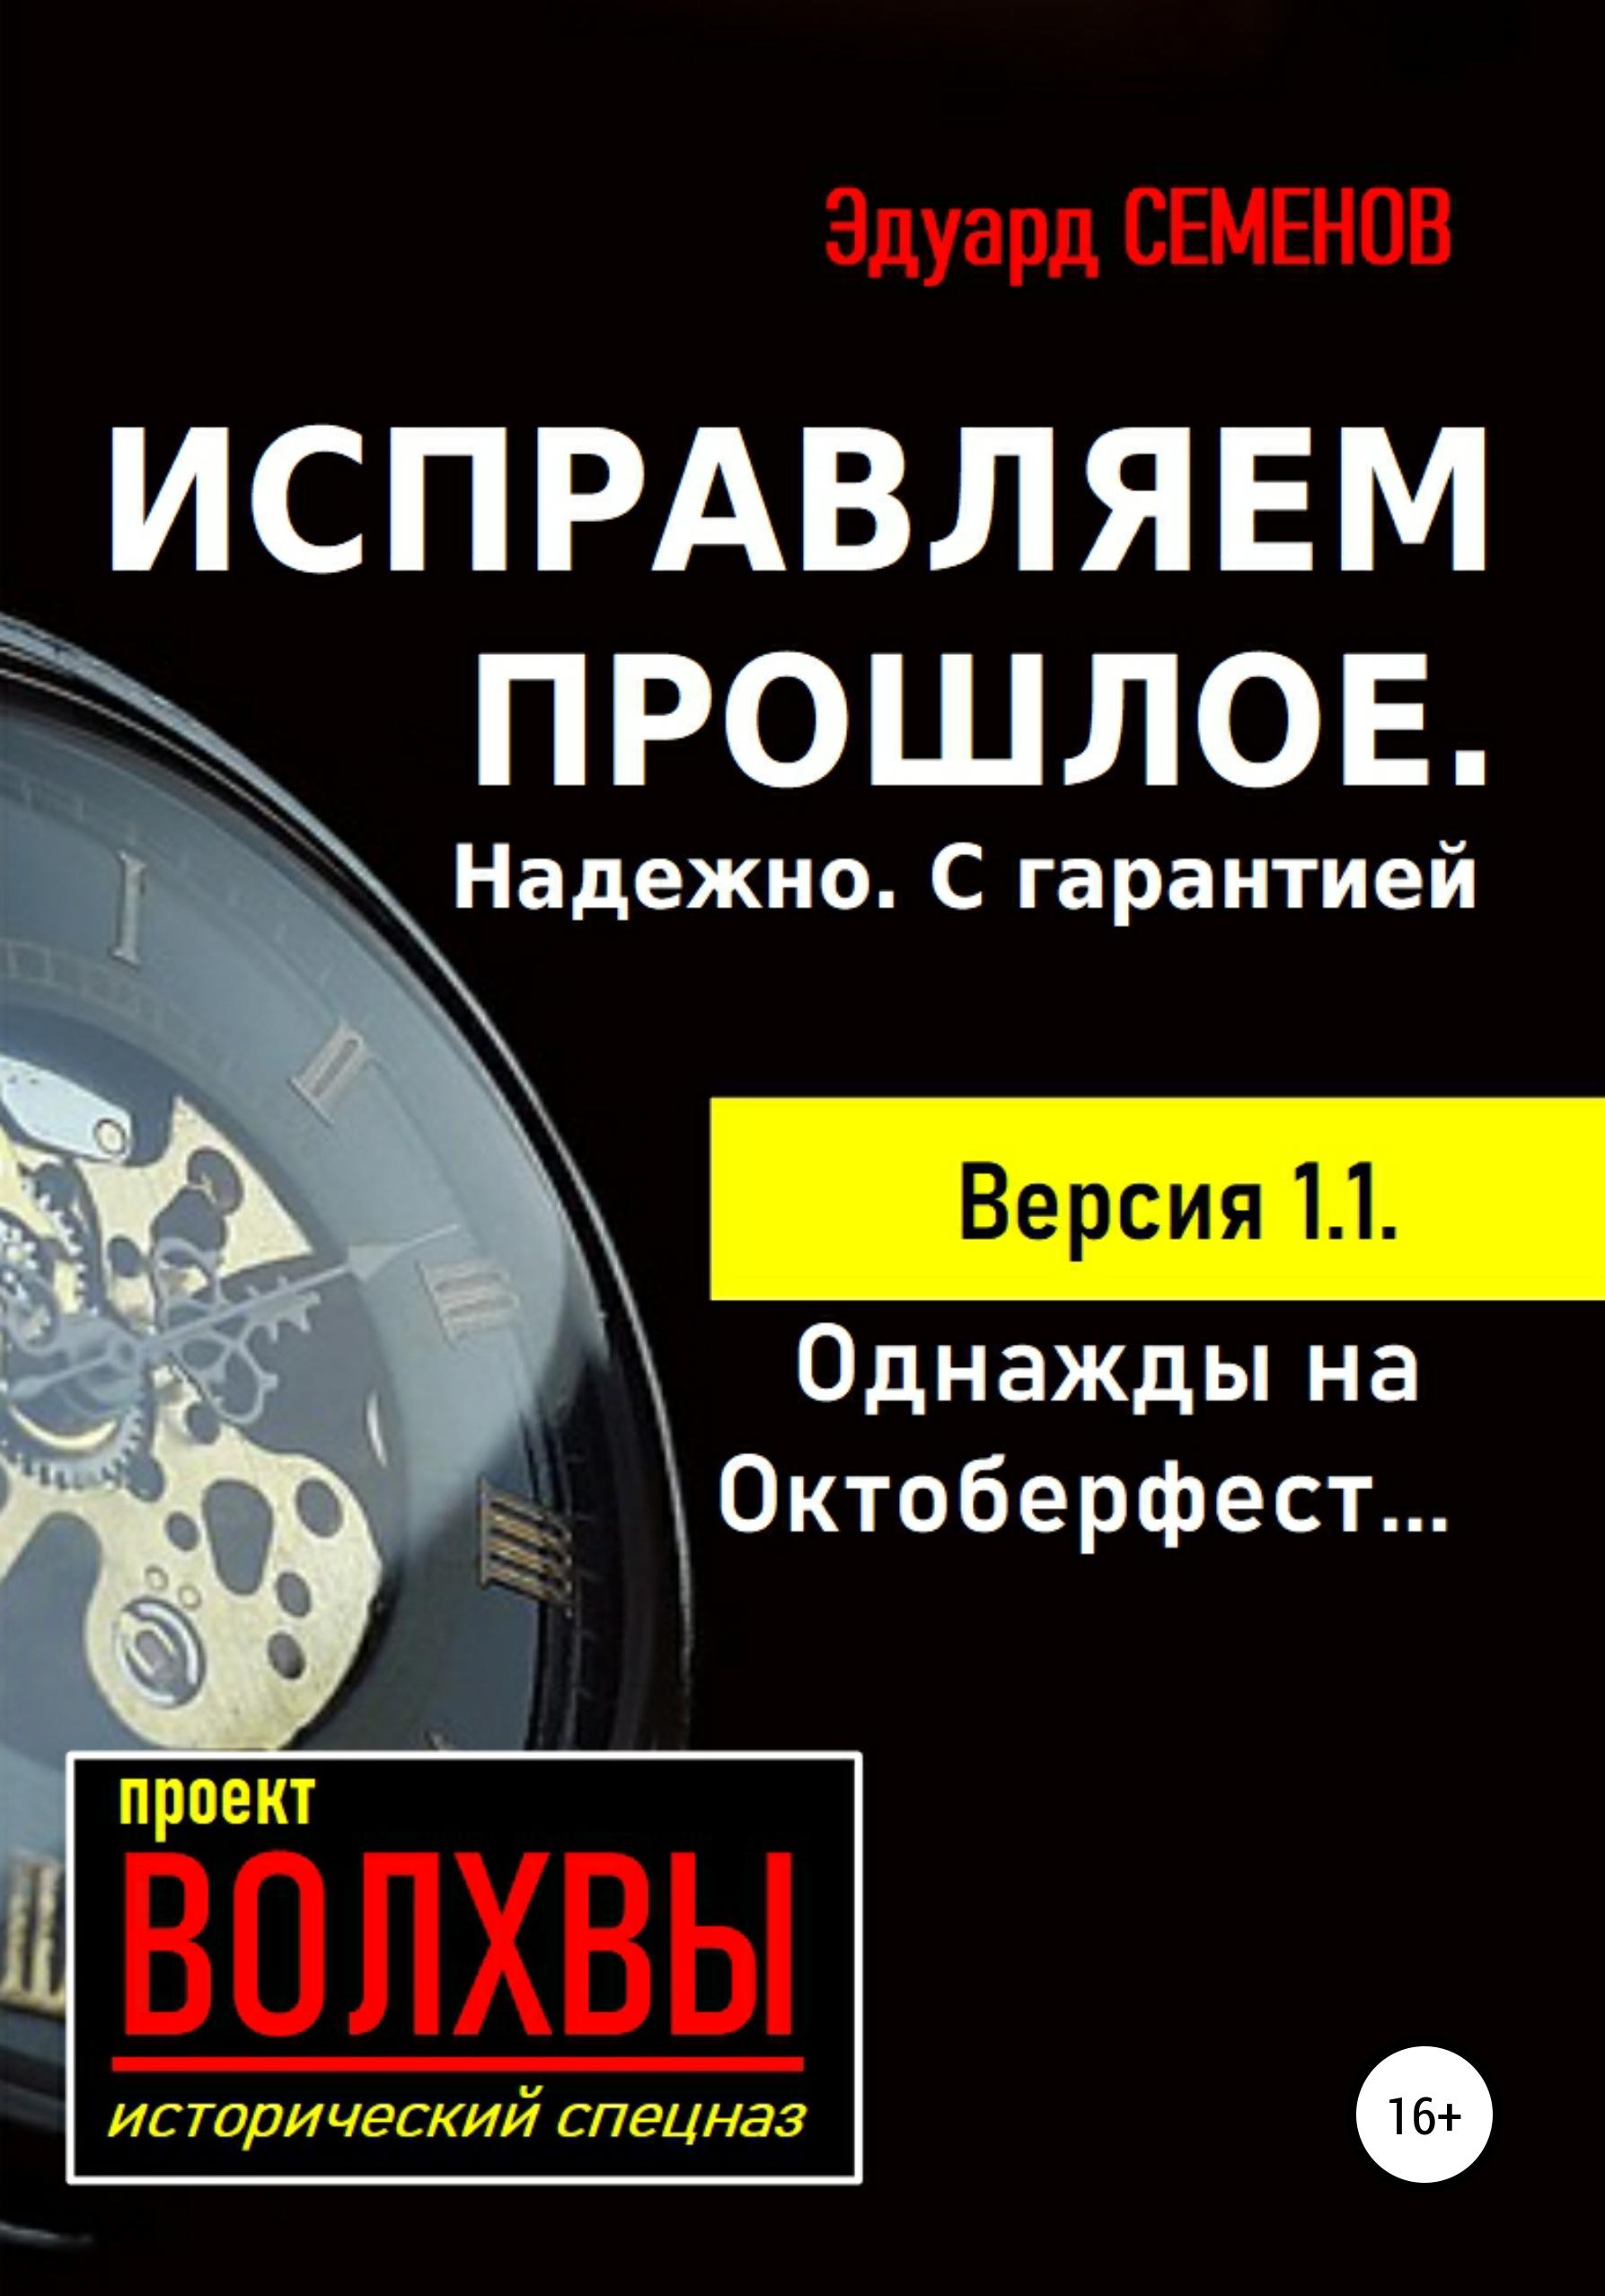 Эдуард Евгеньевич Семенов Волхвы цена 2017